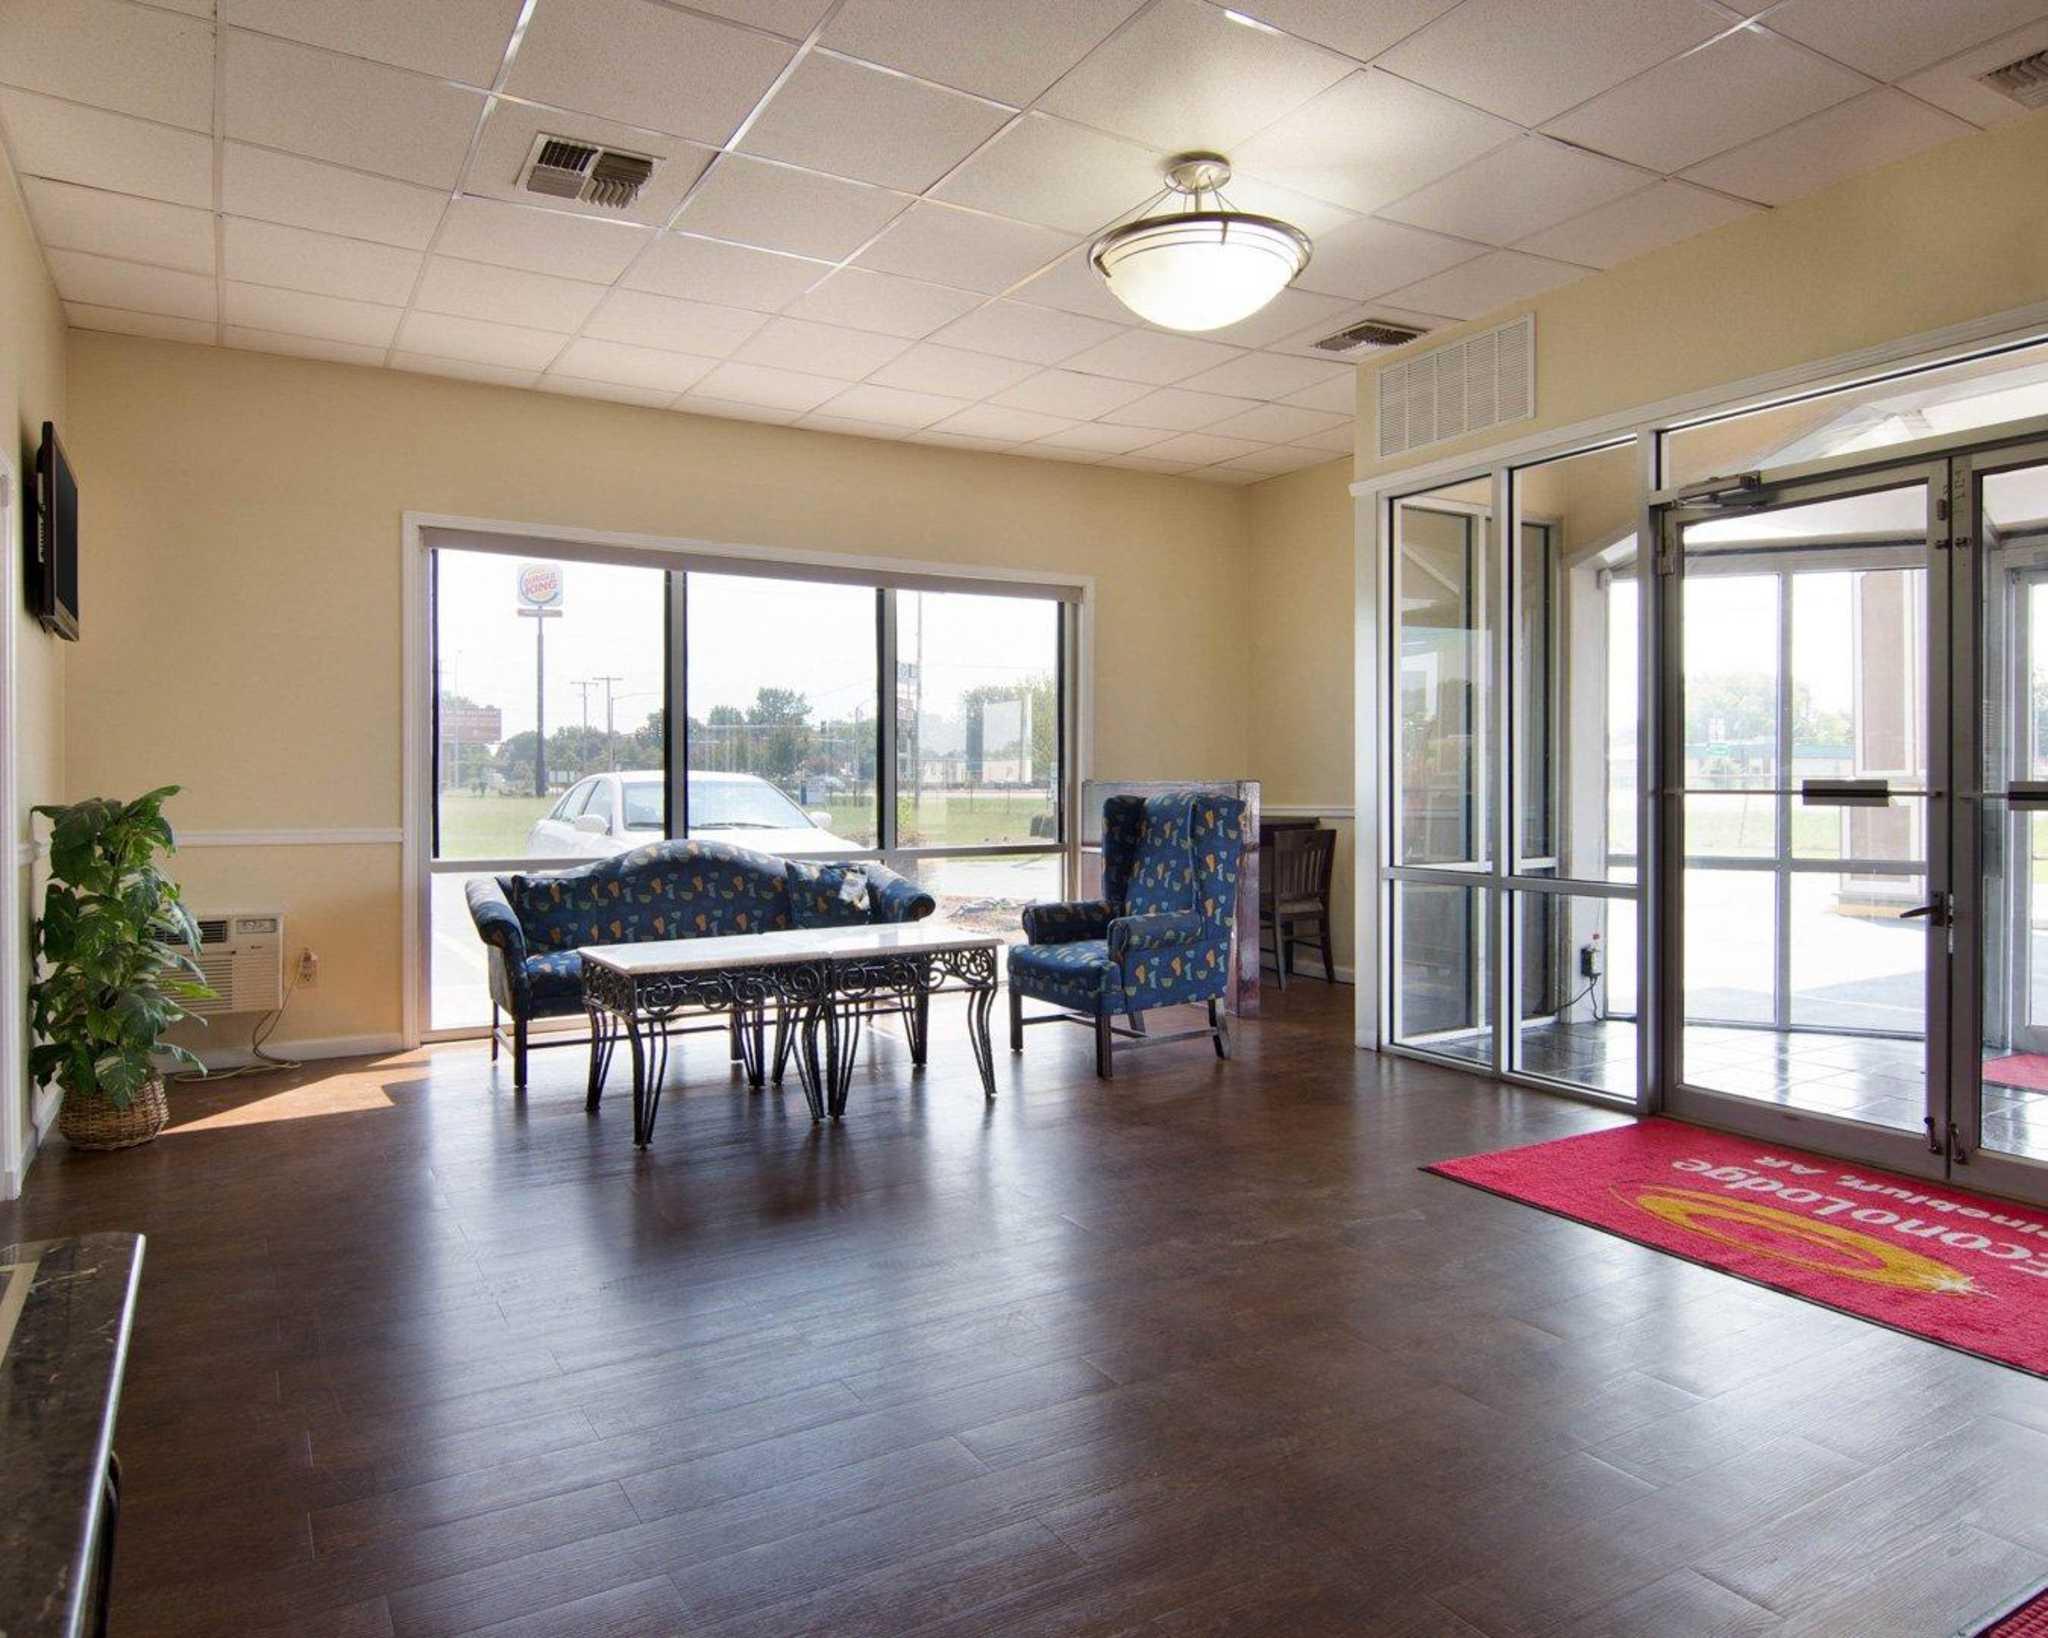 Econo Lodge image 19